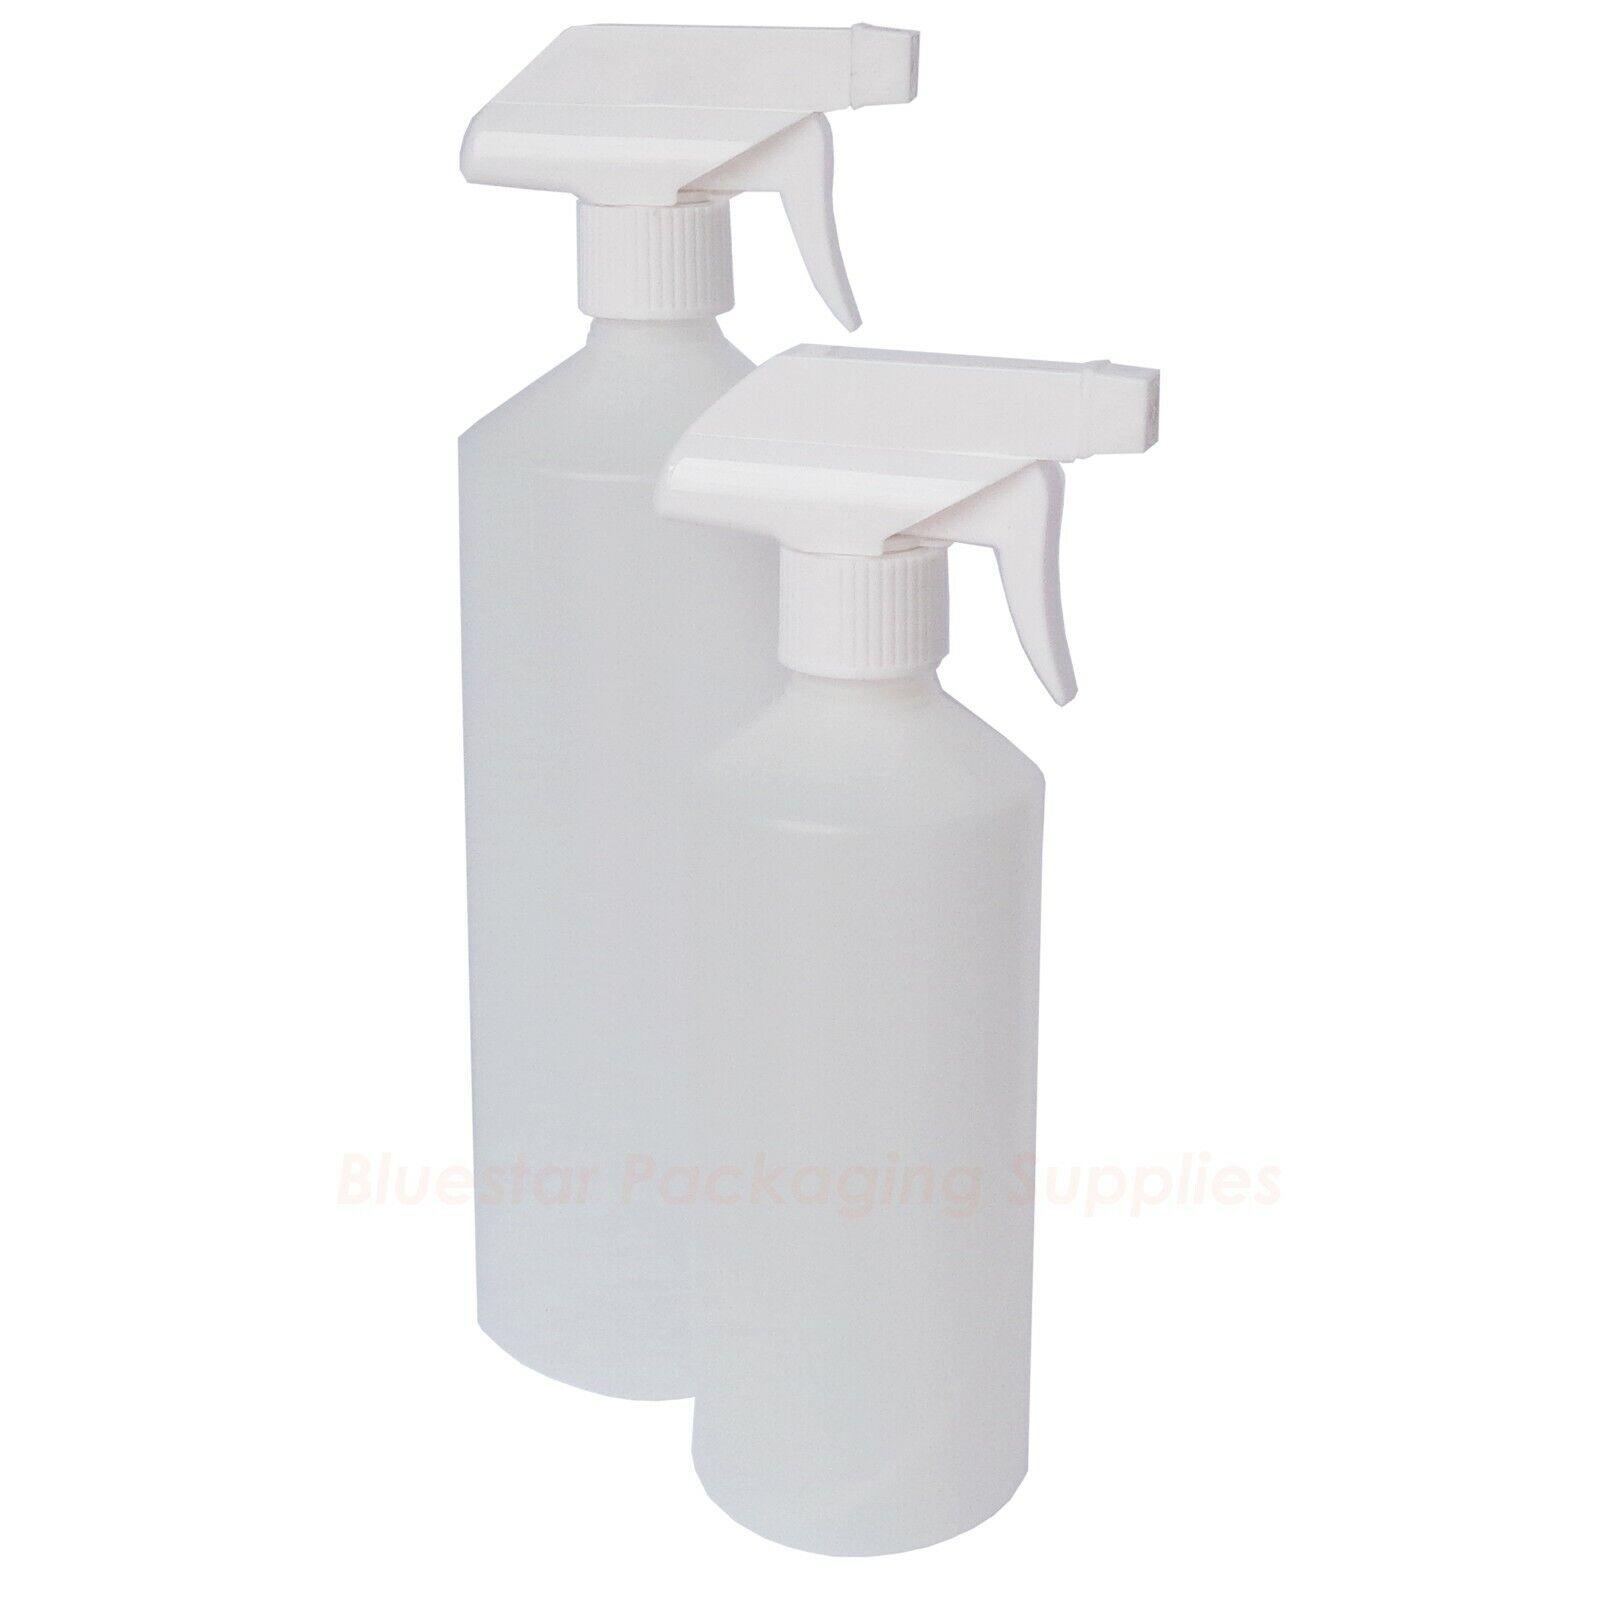 Natural Plastic HDPE Trigger Bottle Car Cleaning Hand Garden Spray 500ml 1000ml